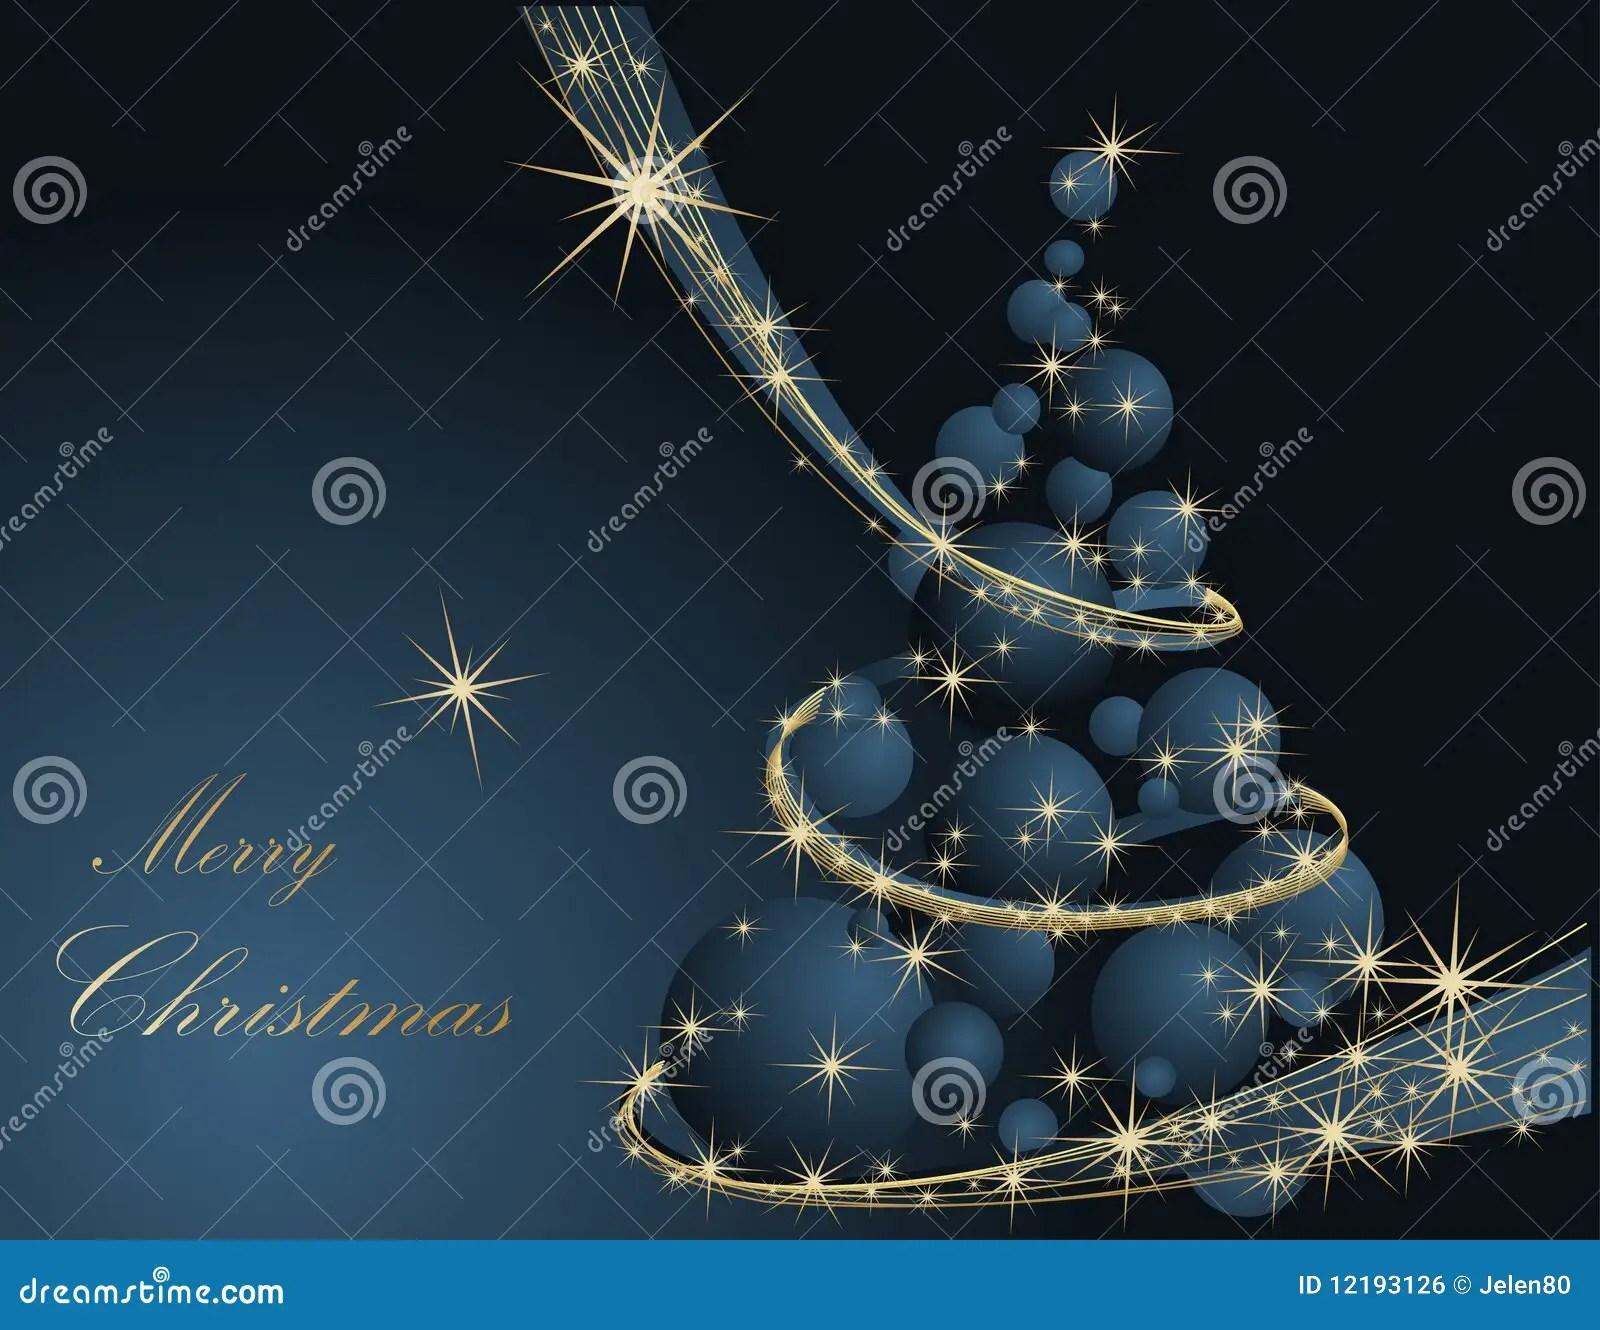 Animated Christmas Tree Wallpaper Free Merry Christmas Stock Vector Image Of Frame Circle